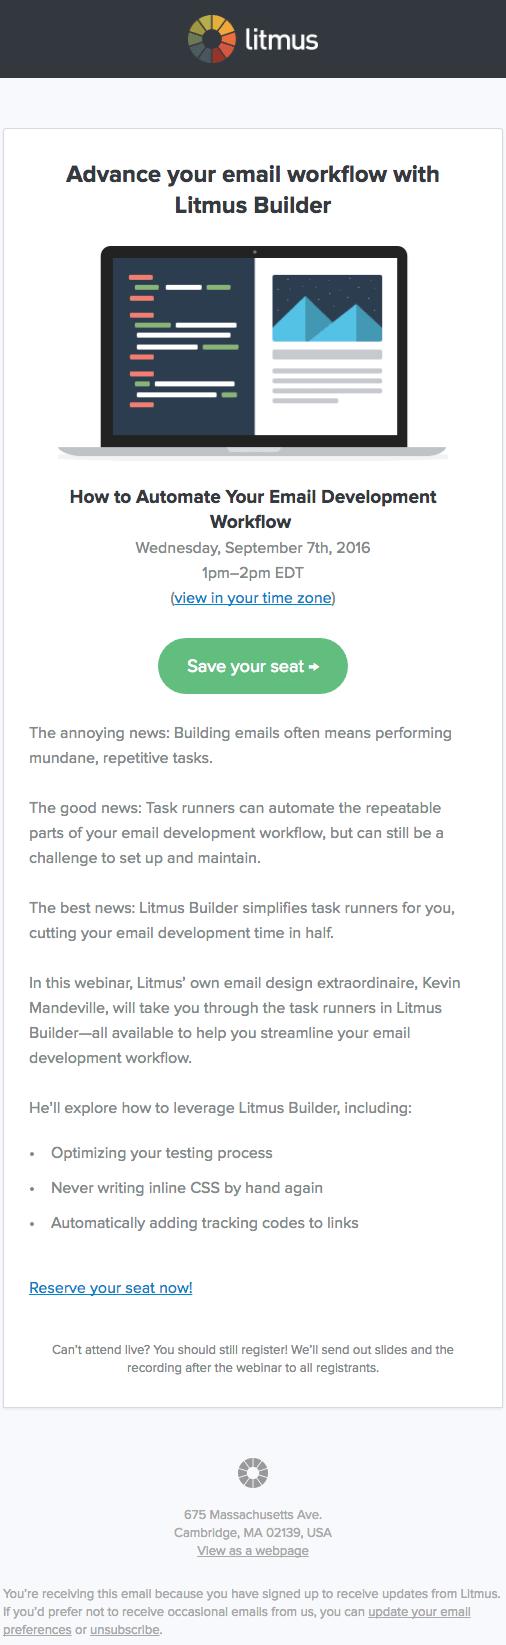 litmus email